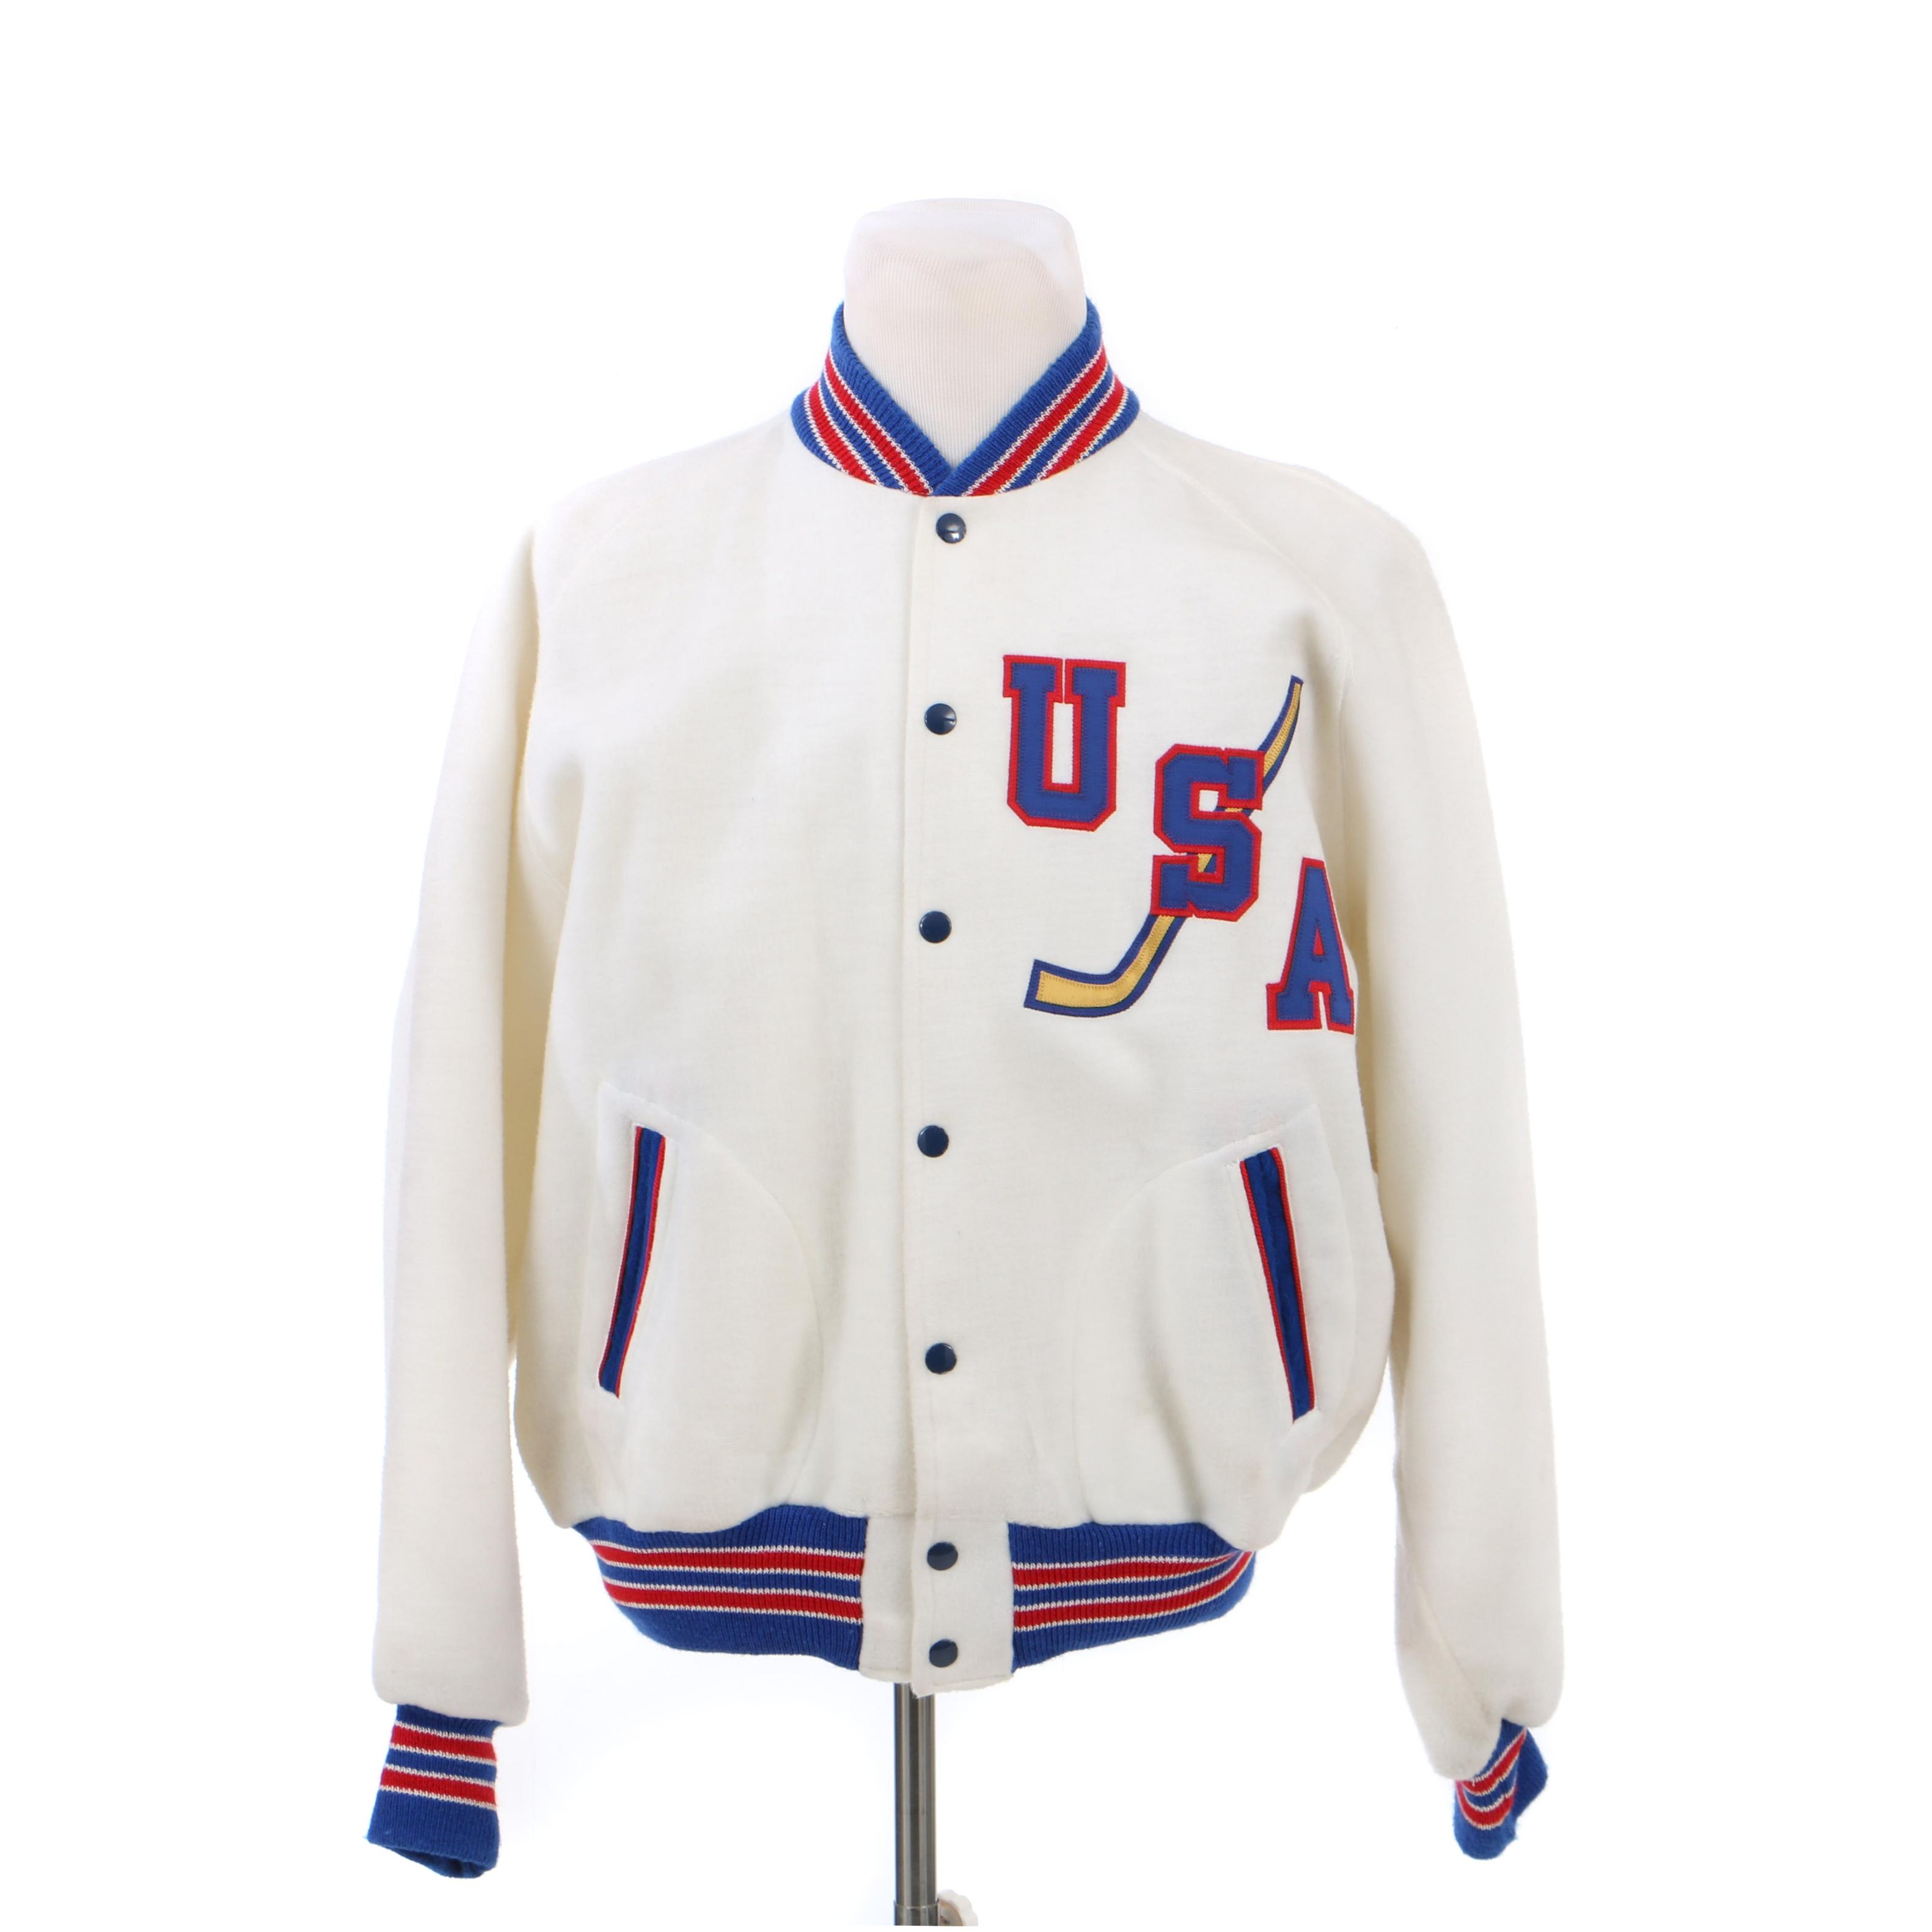 Vintage USA Ice Hockey Bomber Jacket by Powers MFG Co.